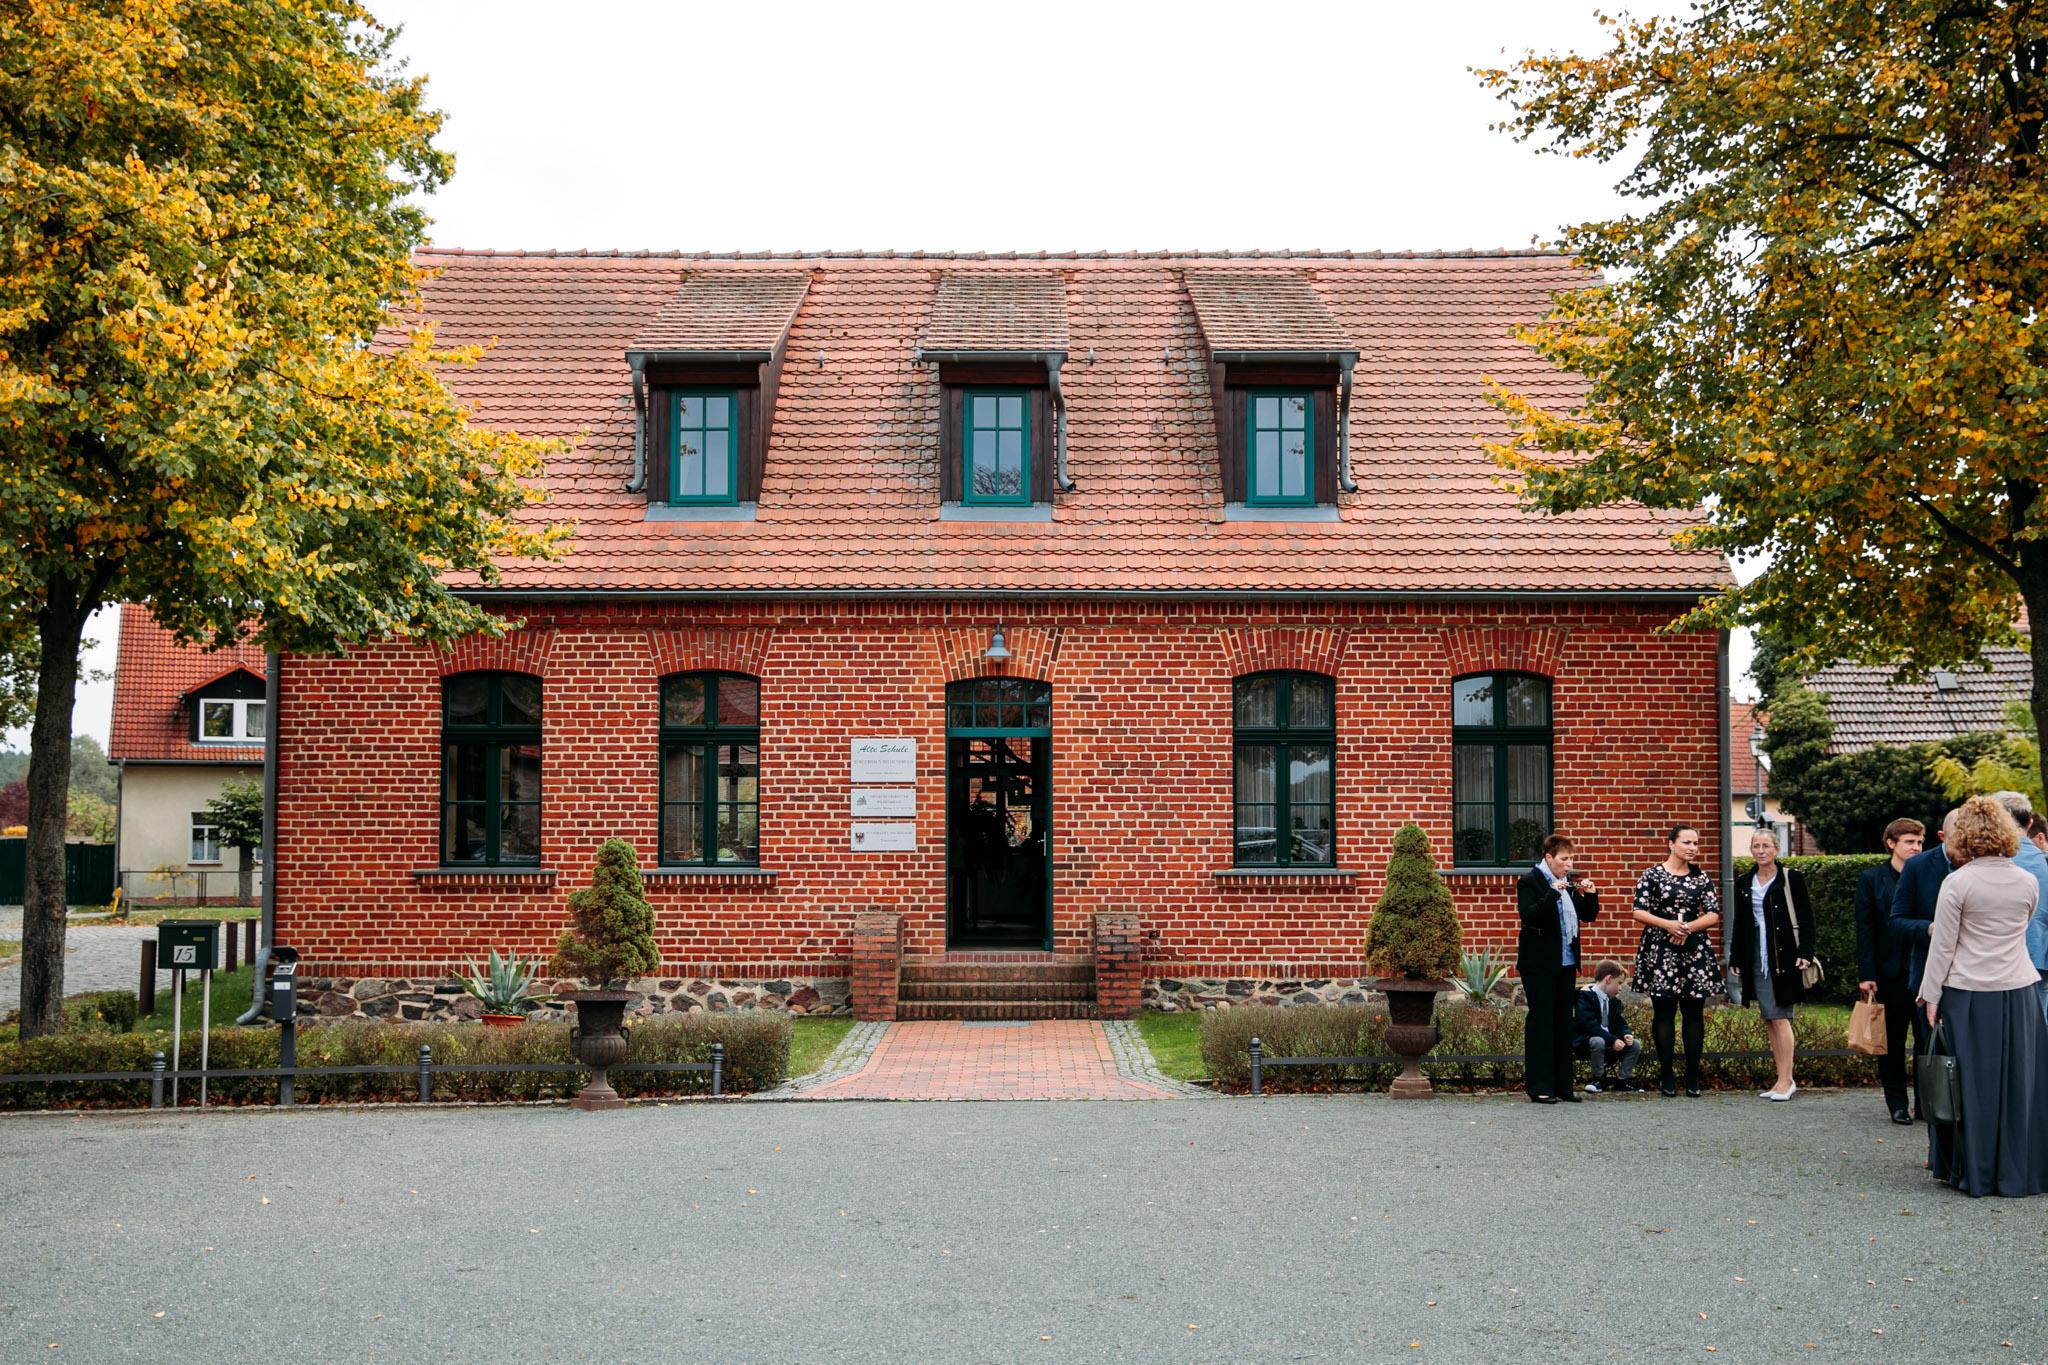 171014_HZ_Potsdam_JFRM0013_Prev_0001.jpg